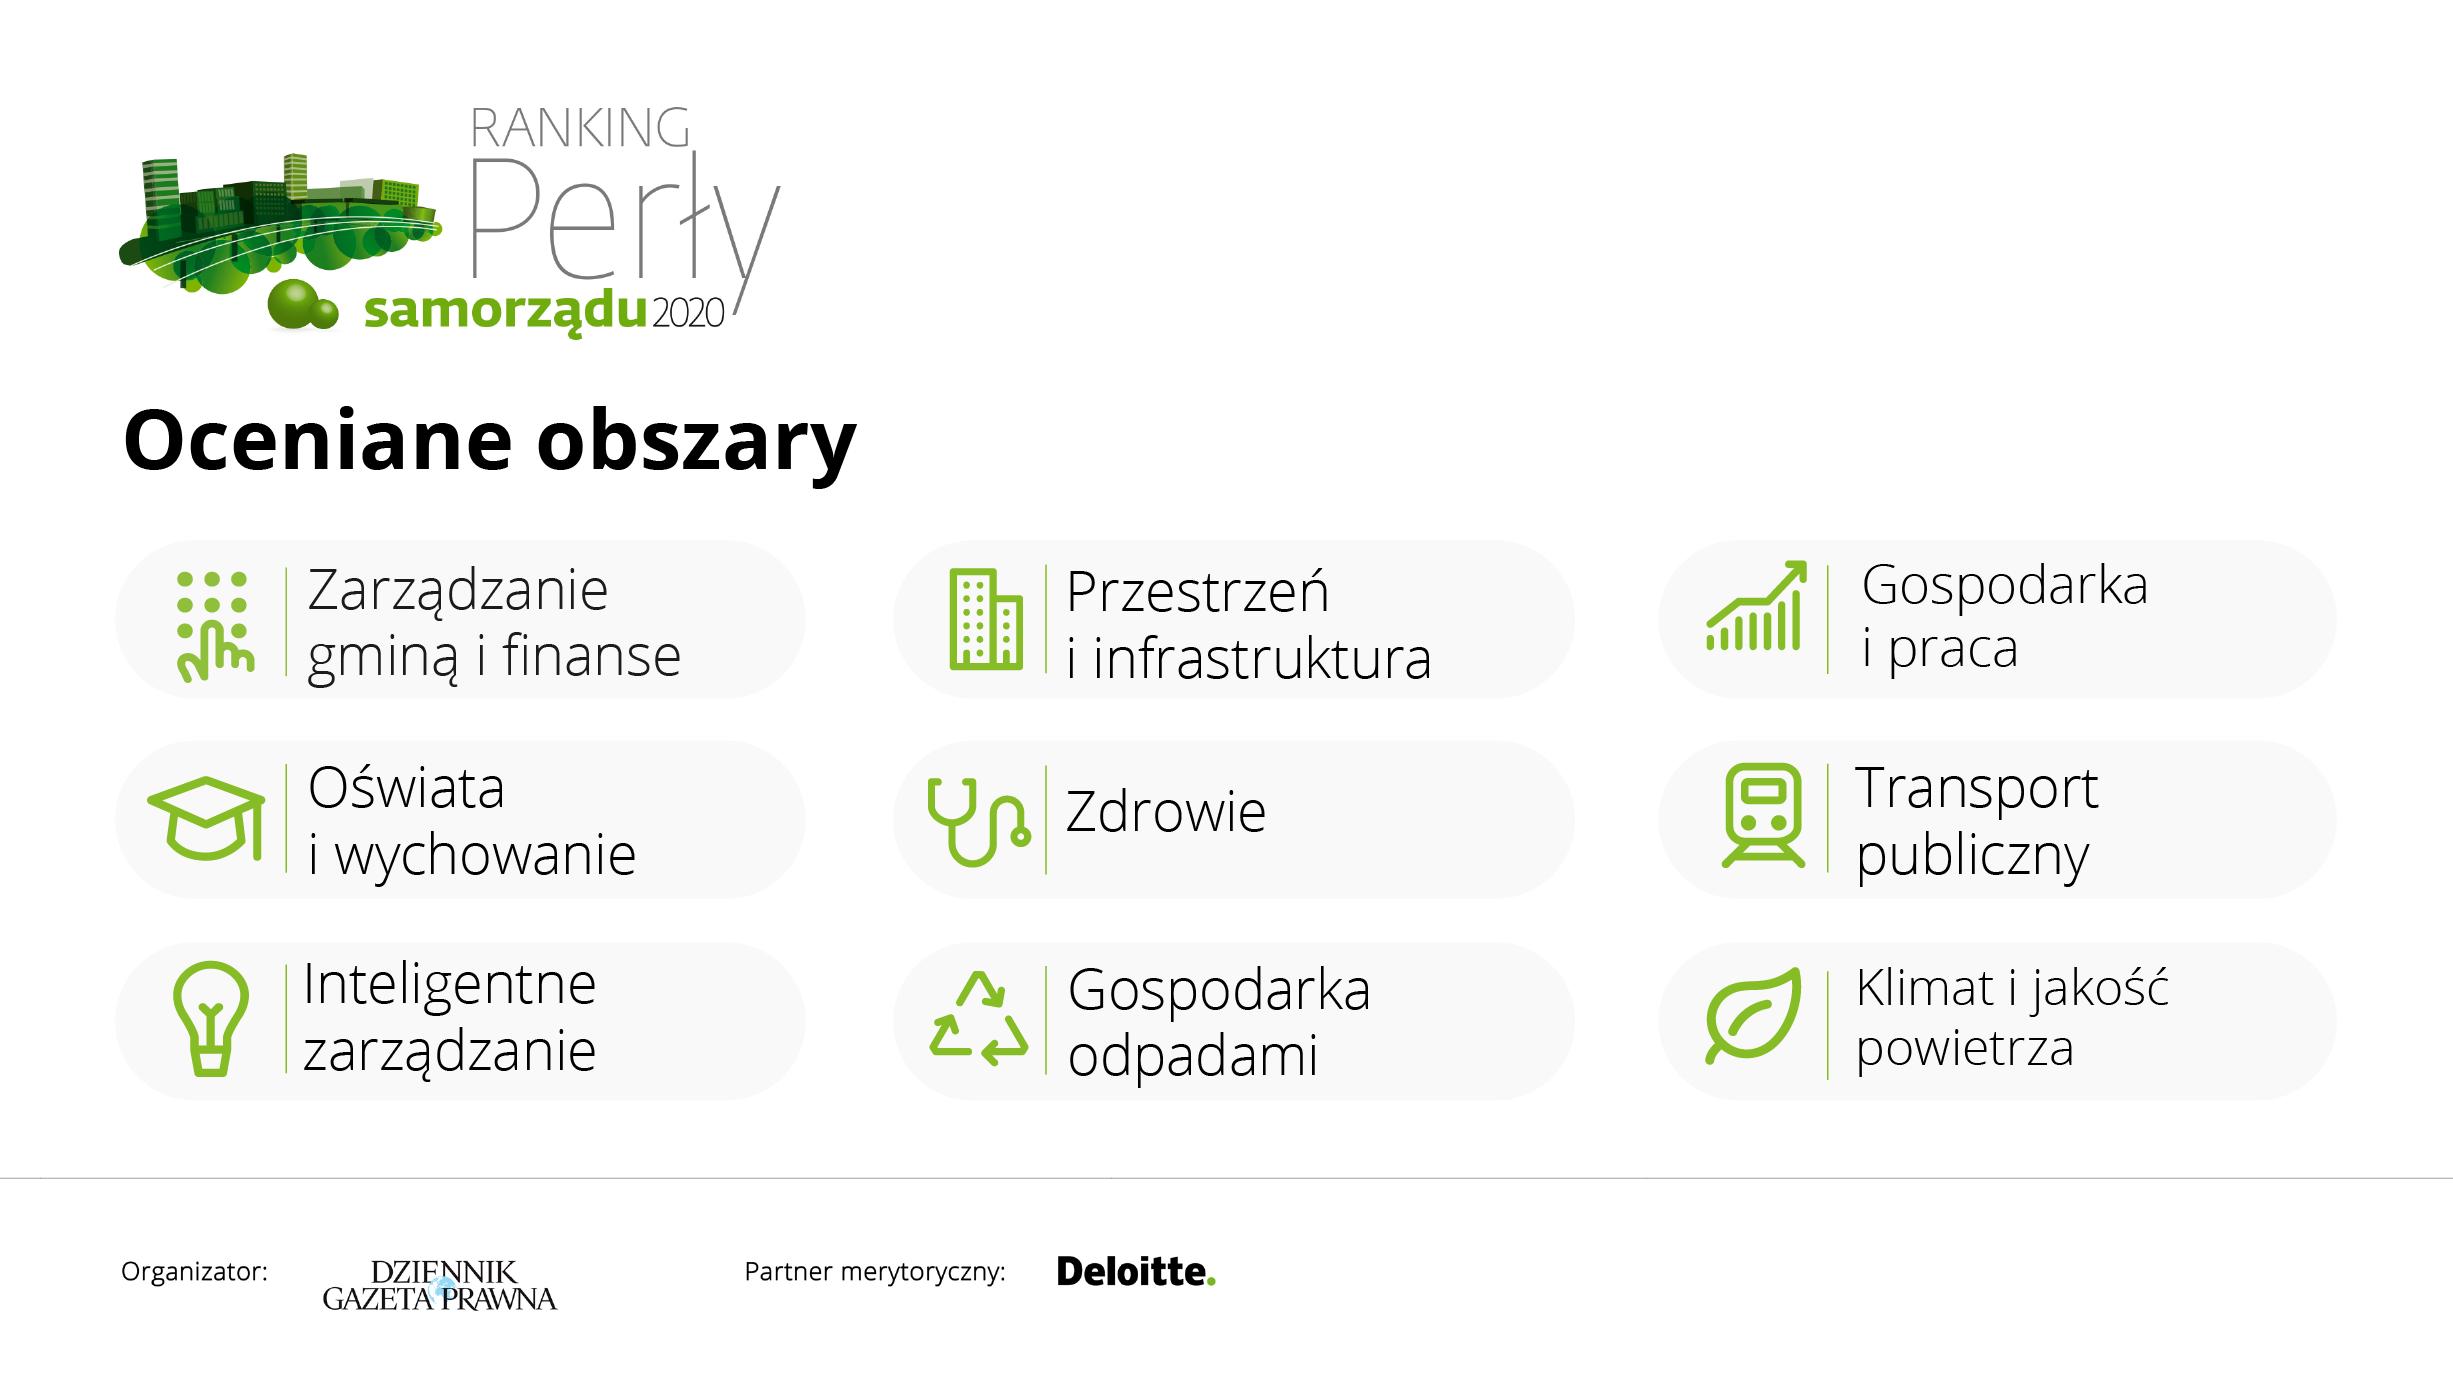 pl_Ranking-Perly-Samorzadu-2020_obszary.png (2453×1381)